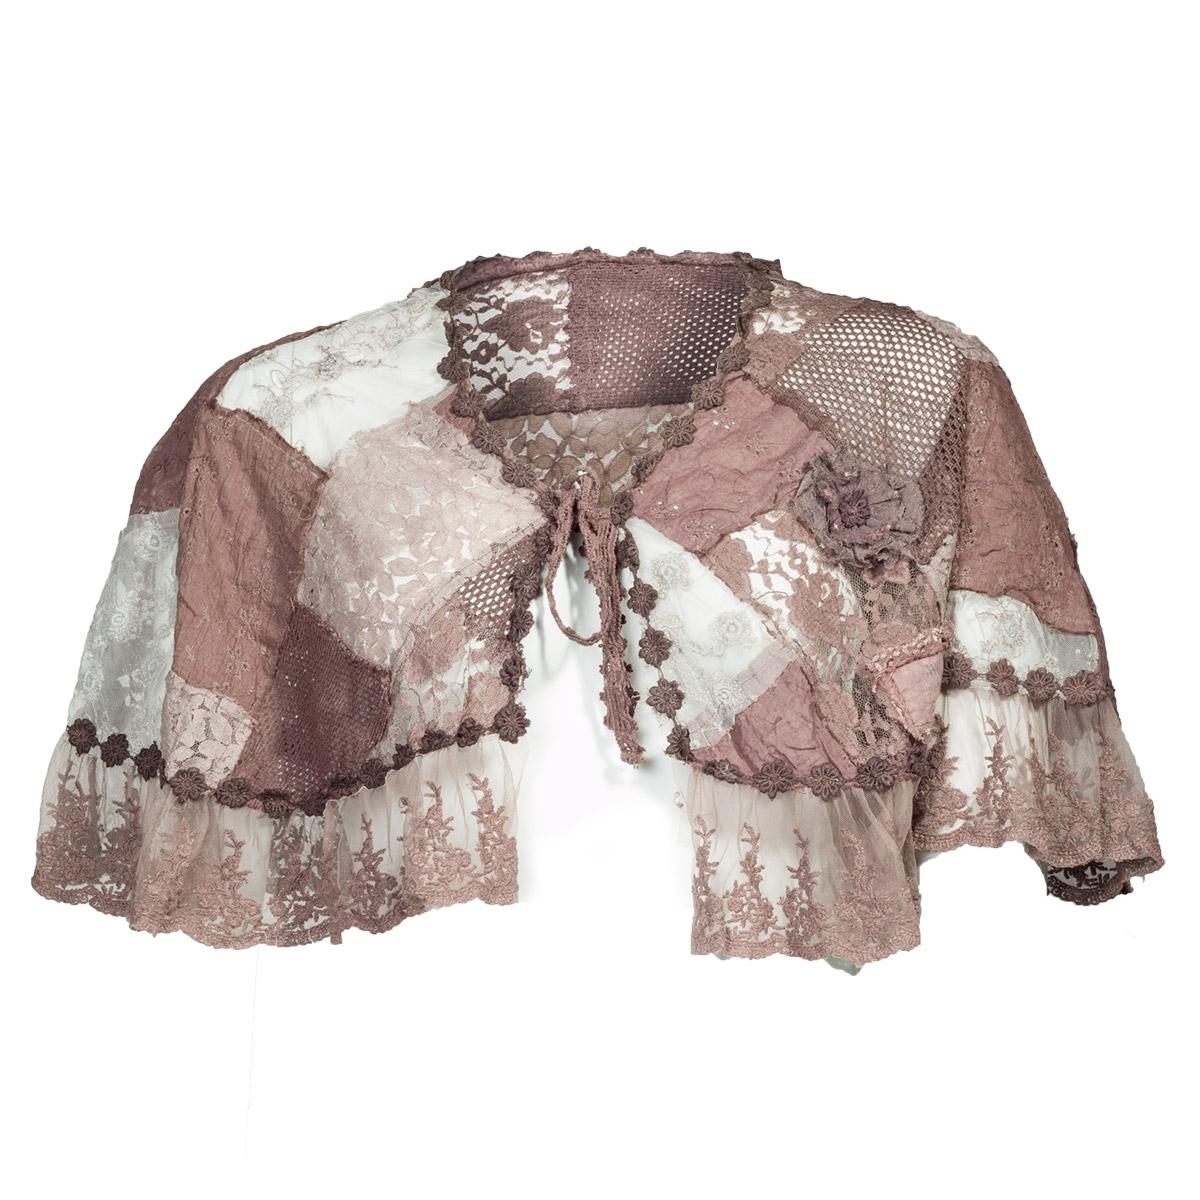 Mørk rosa sjal med blondekant